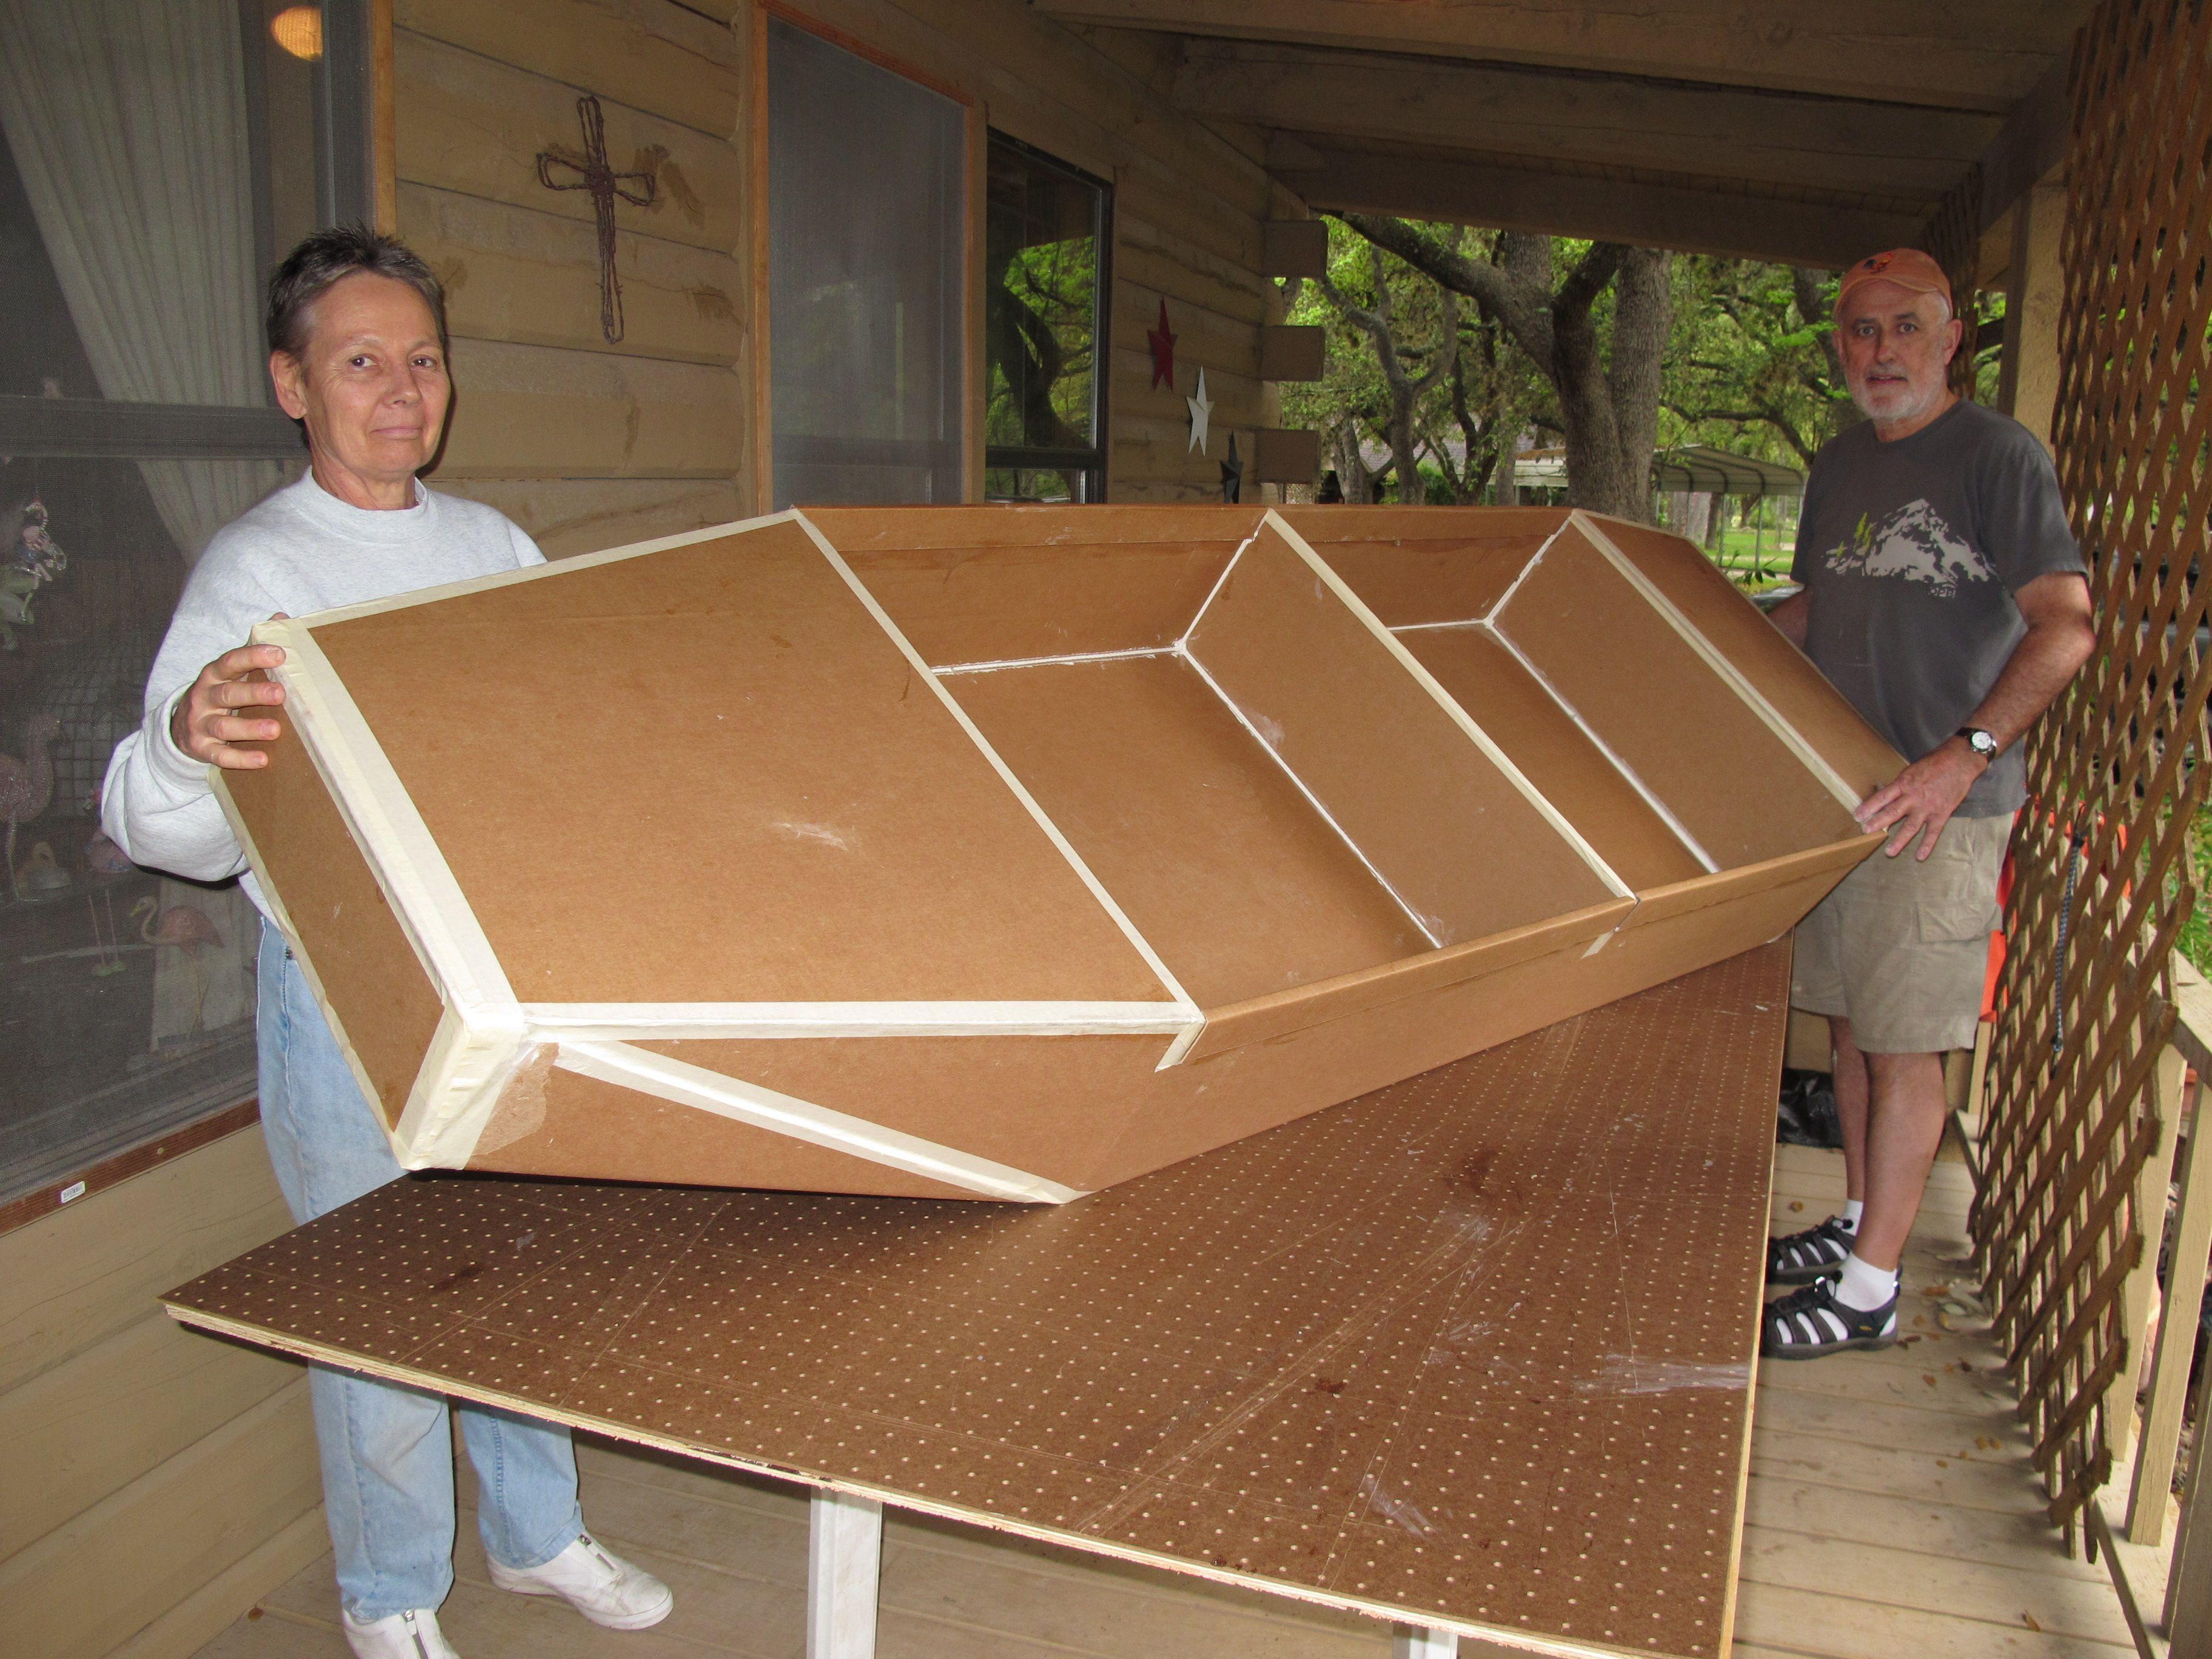 Cardboard Boat Building | Boating, Cardboard boat race and Craft